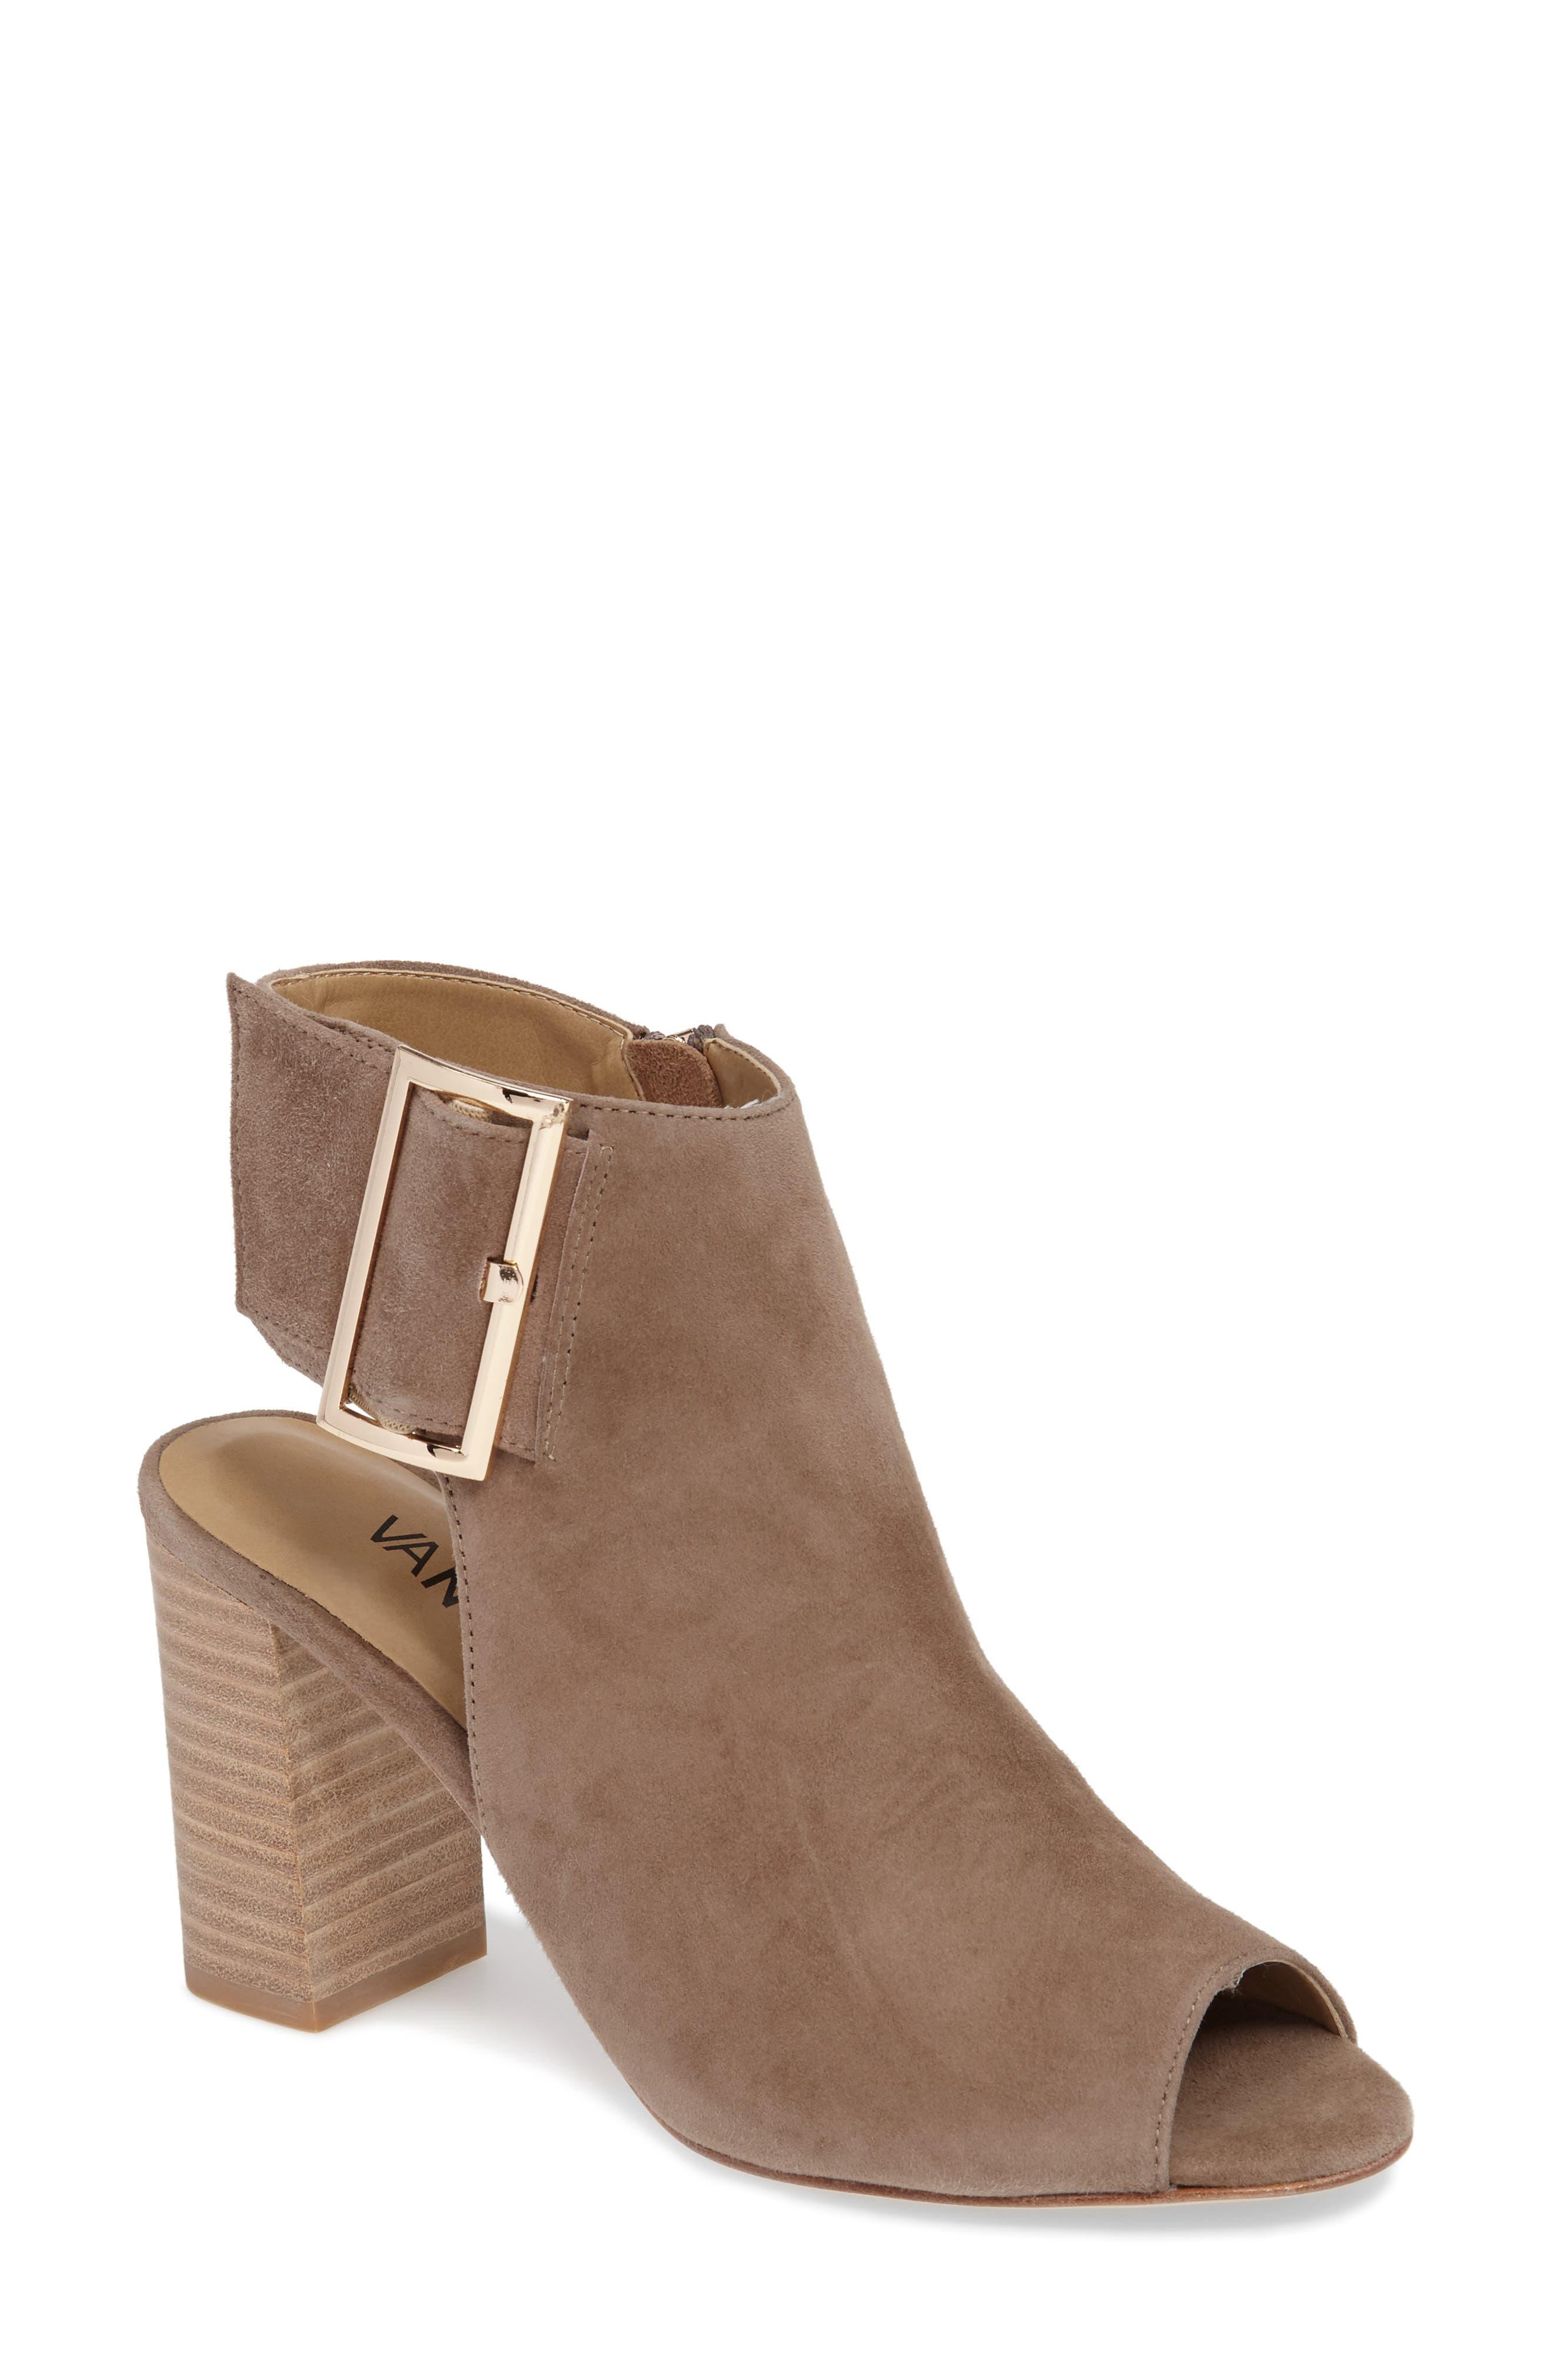 Main Image - VANELi 'Bisa' Peep Toe Slingback Sandal (Women)